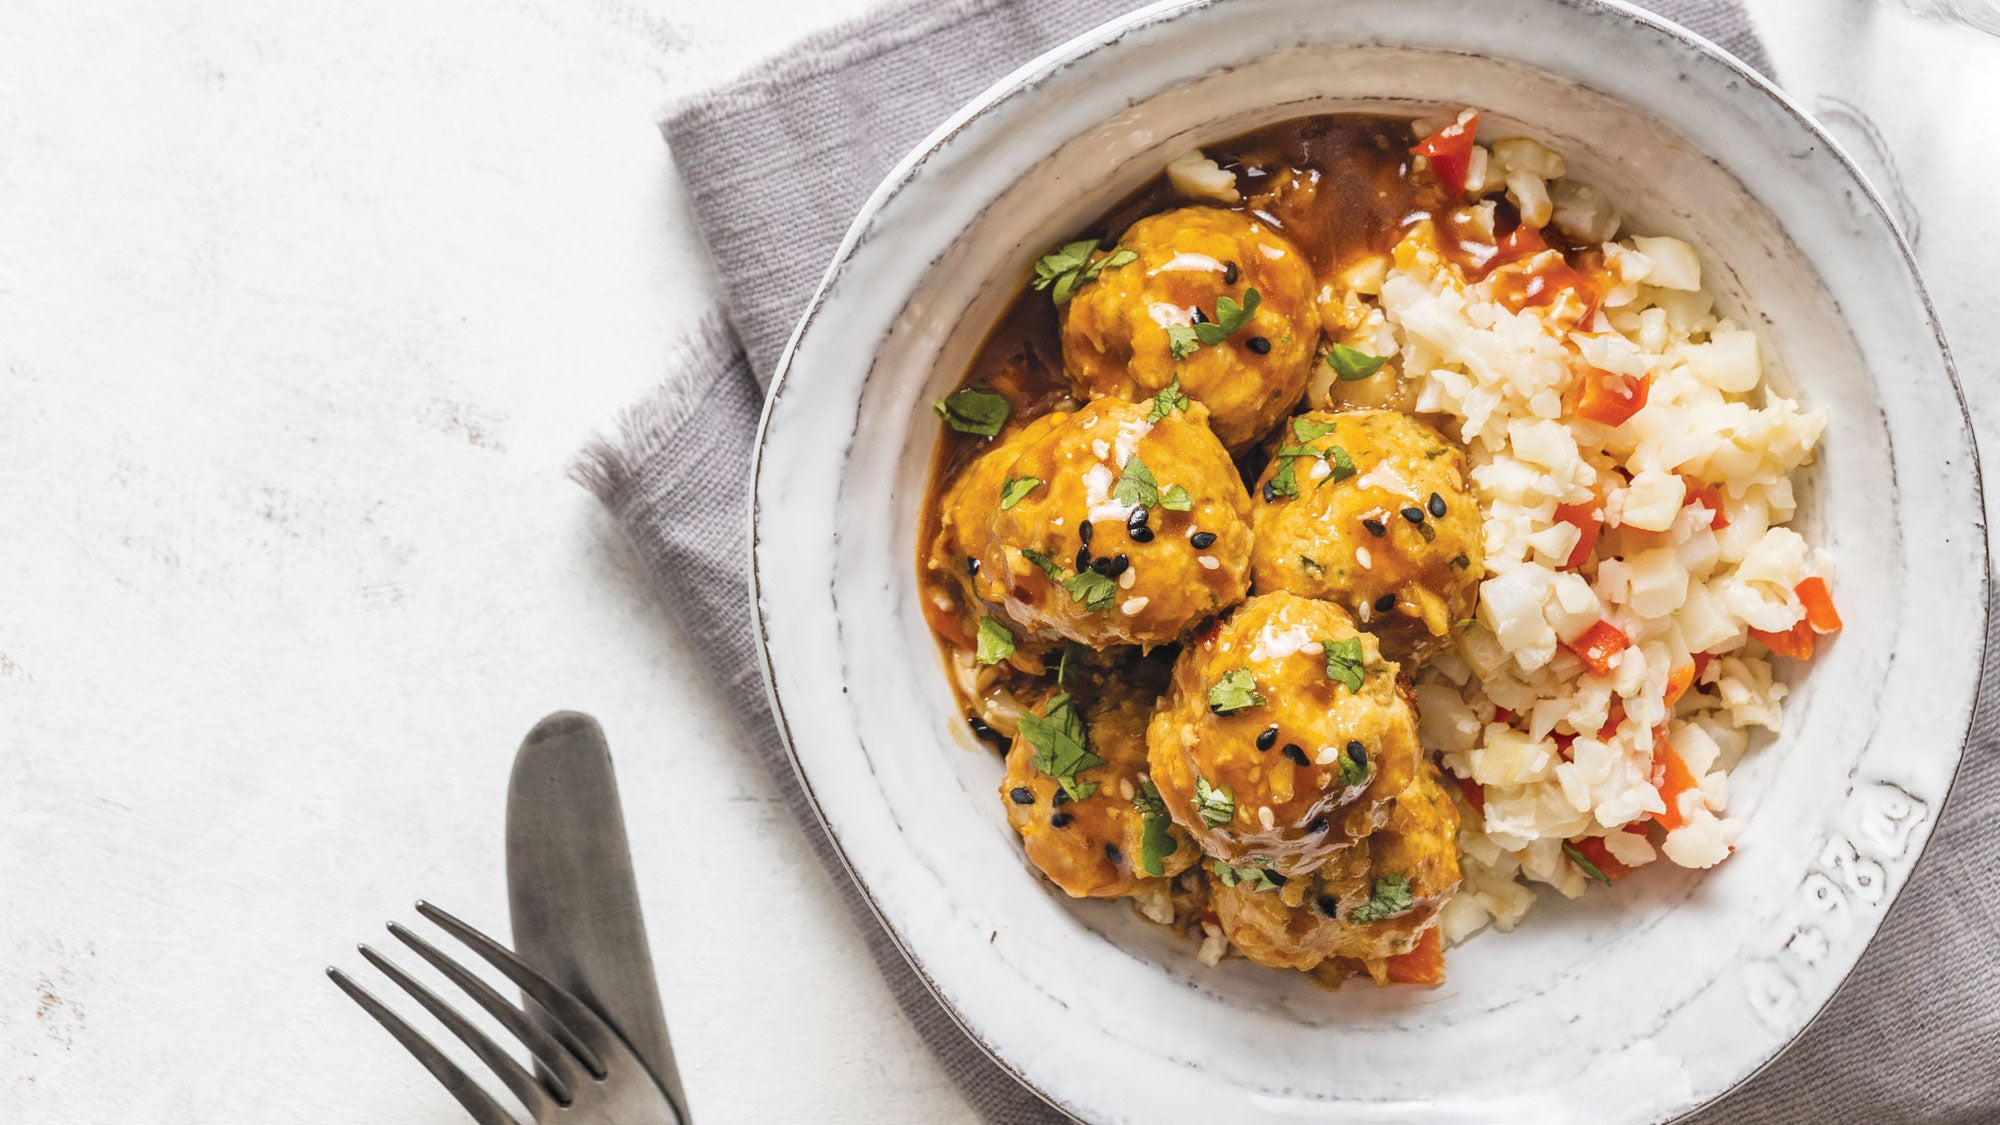 Ginger Turkey Meatballs with Coconut Cauli Rice recipe